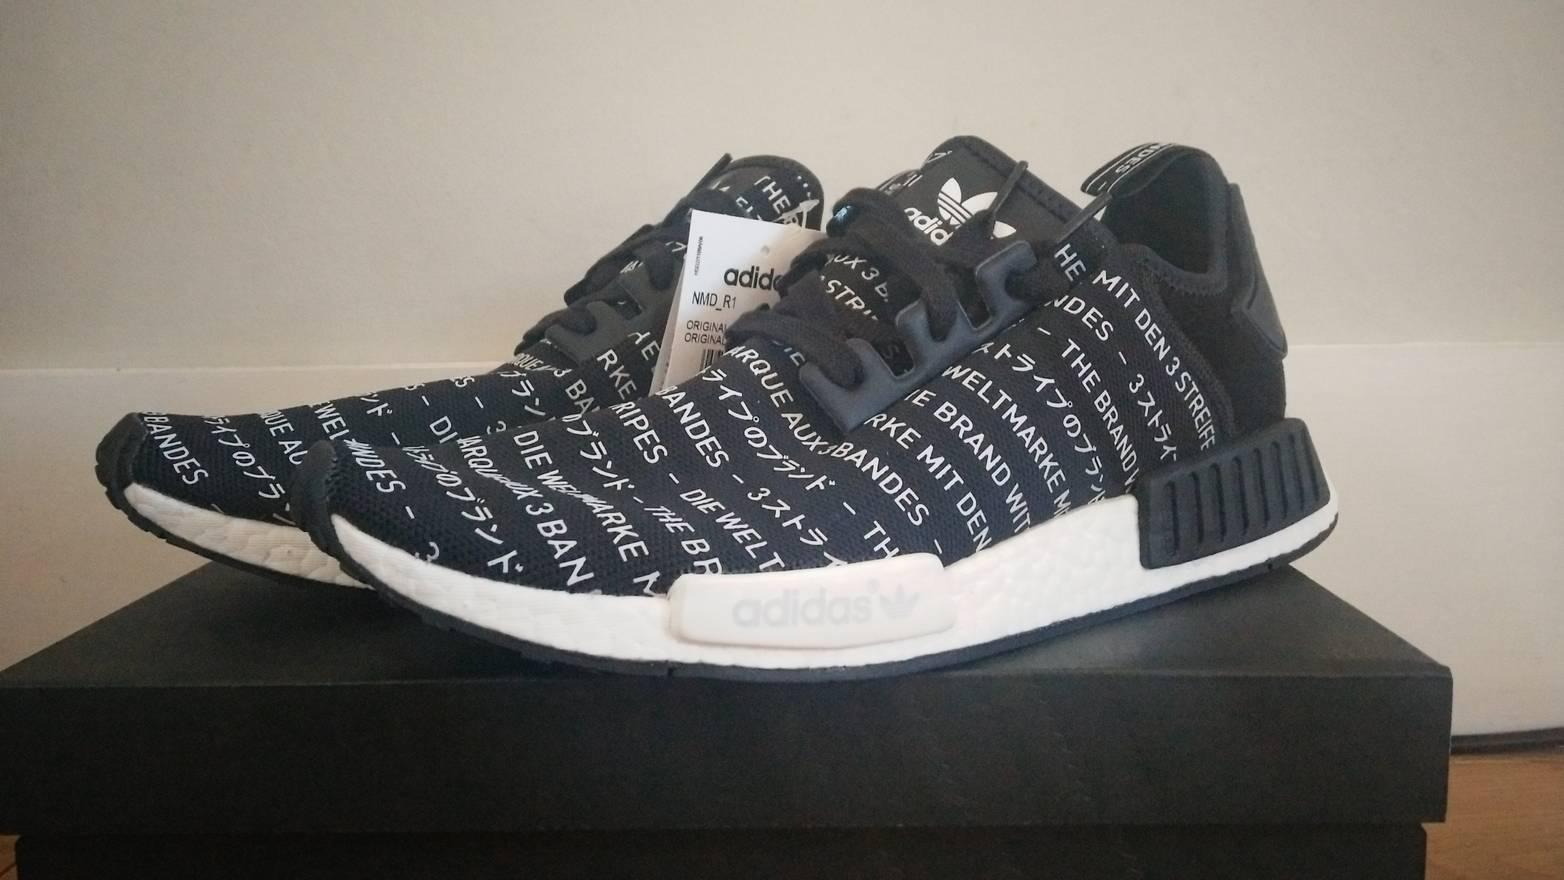 9be1a8467 ... 50% off adidas adidas nmd r1 blackout core black size us 11.5 eu 44 45